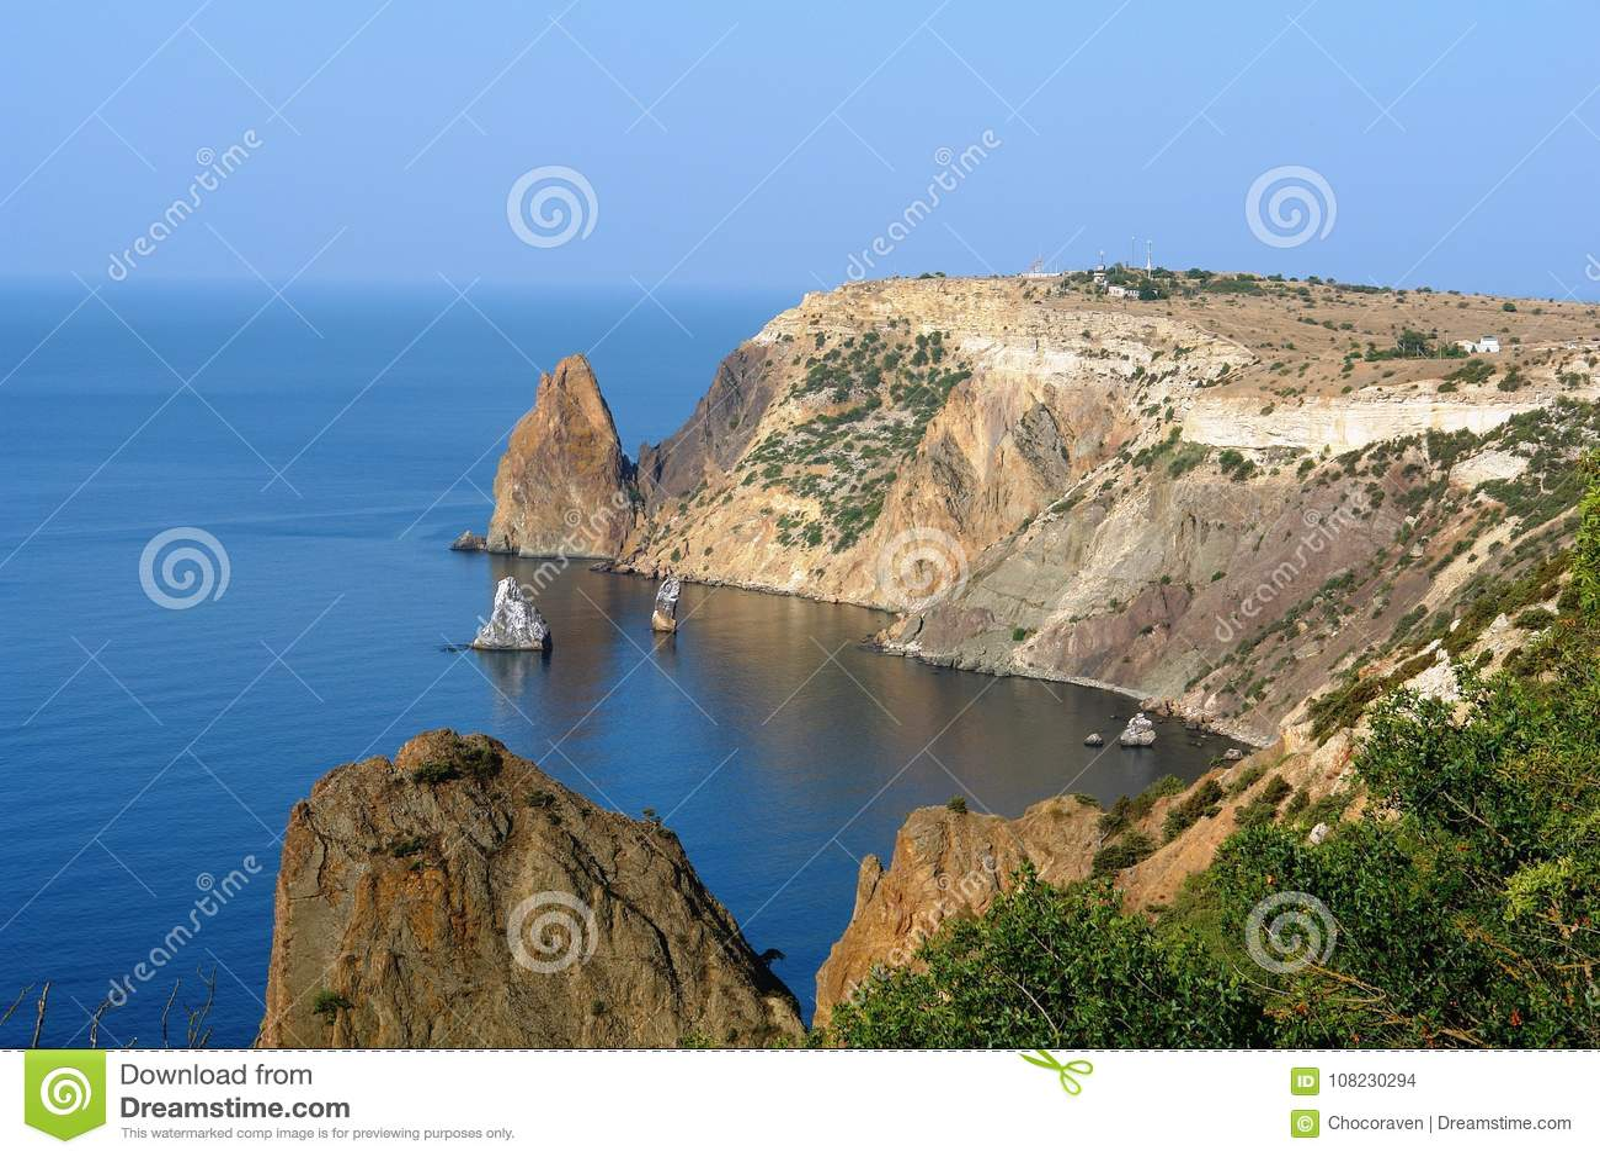 Fiolent udd Sevastopol Crimea